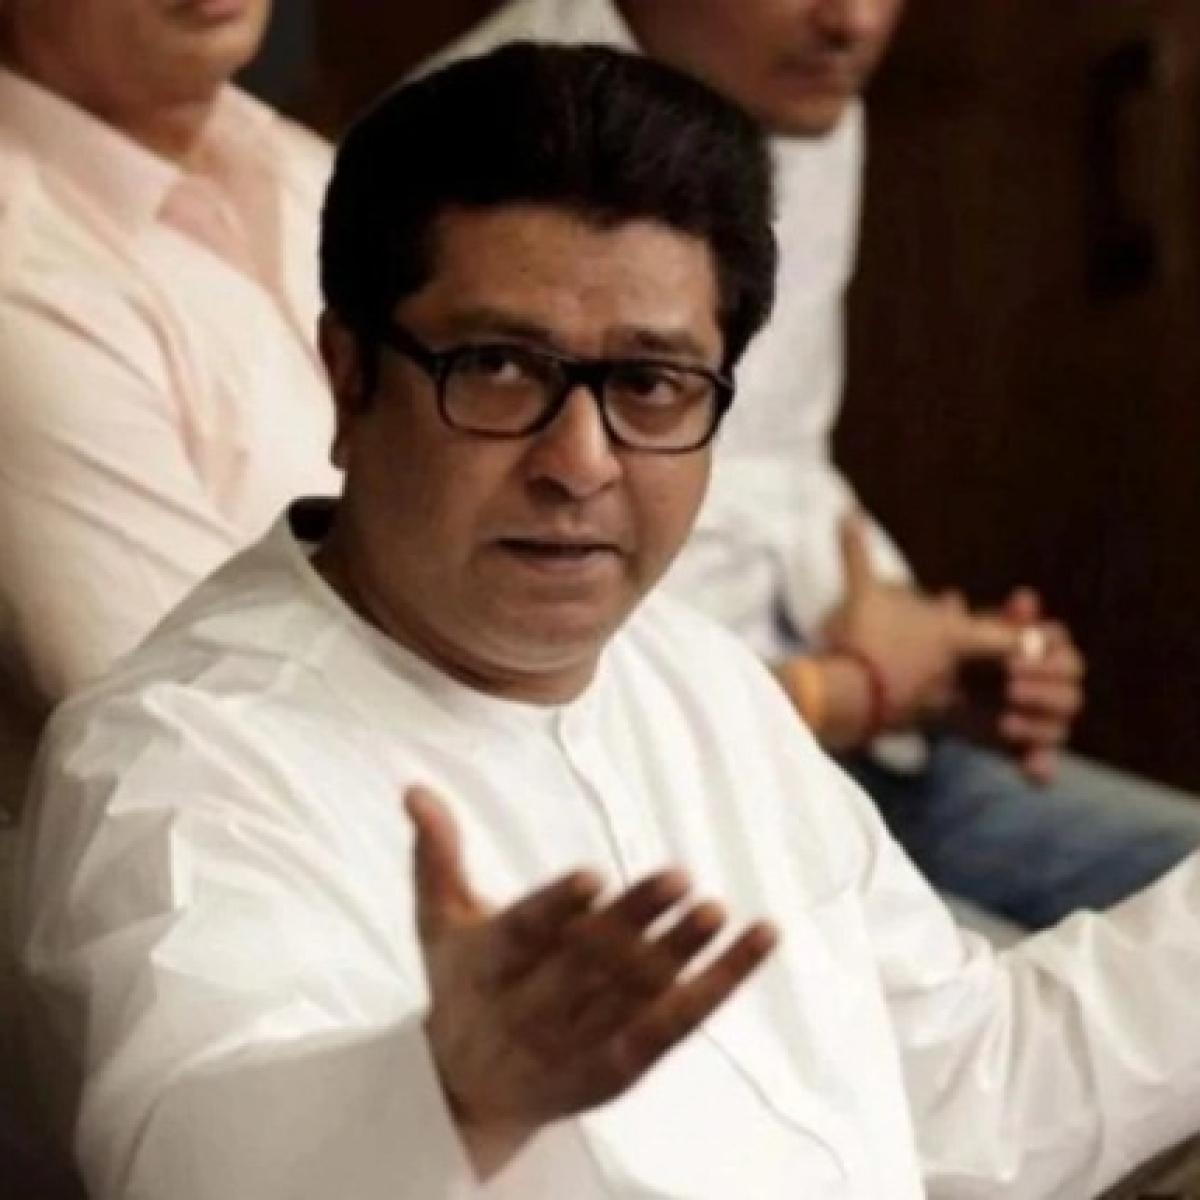 Raj Thackeray warns party members to not address him as 'Hindu Hriday Samrat'